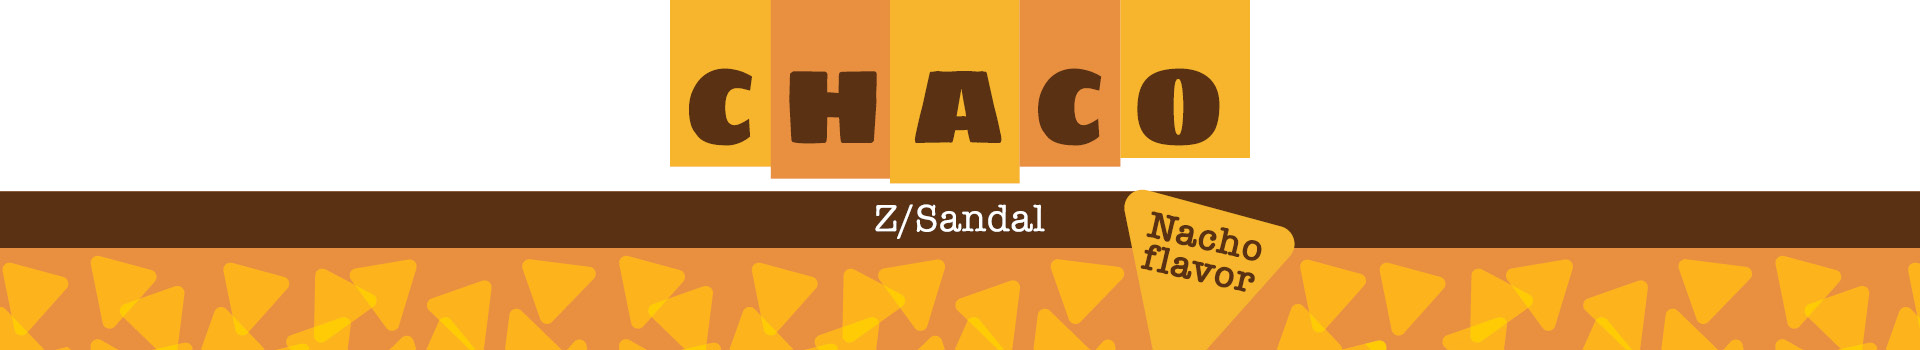 Chaco Munchies Nachos